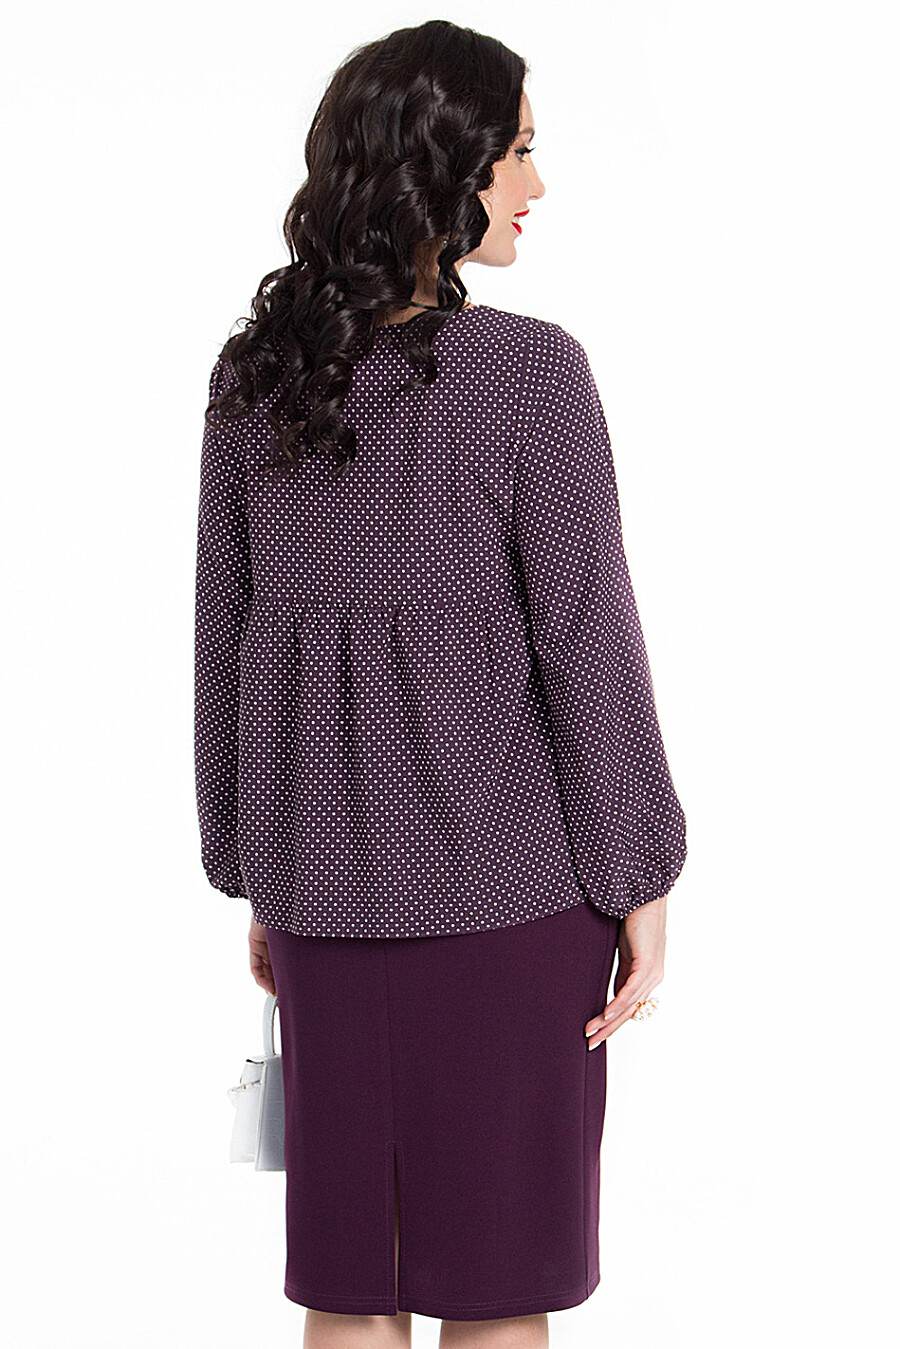 Костюм(Блуза+Юбка) LADY TAIGA (272245), купить в Moyo.moda